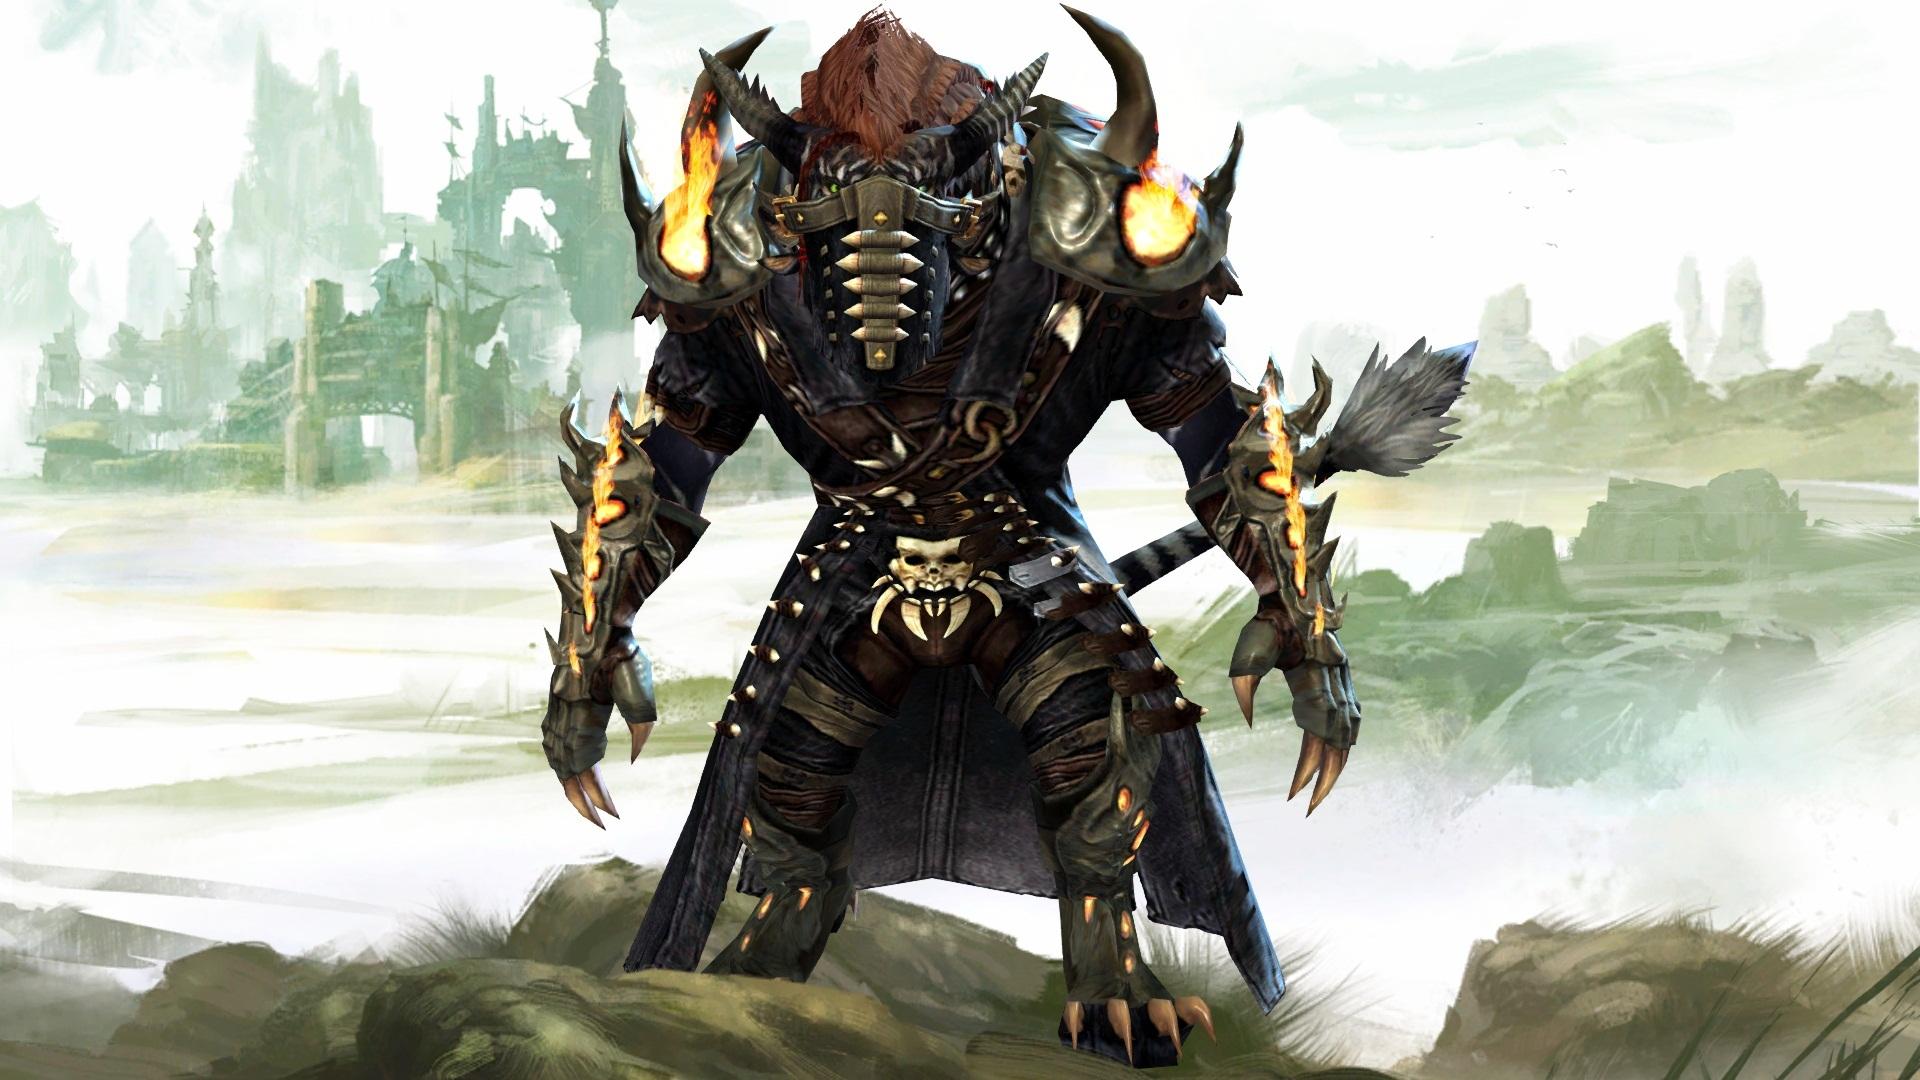 guild wars 2 armor - photo #38